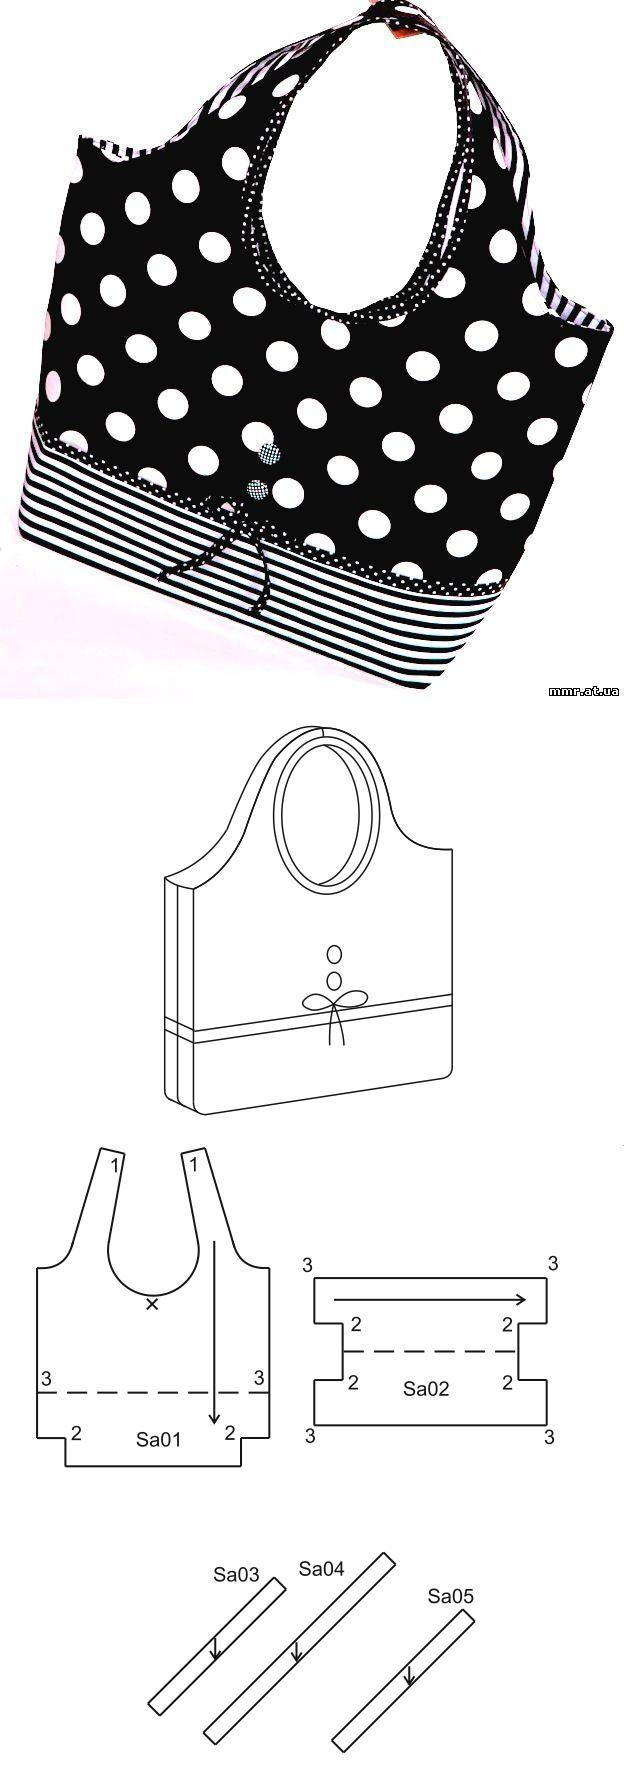 Pin de Joseane Grossl Kock en Bolsa | Pinterest | Bolsos, Costura y Tela